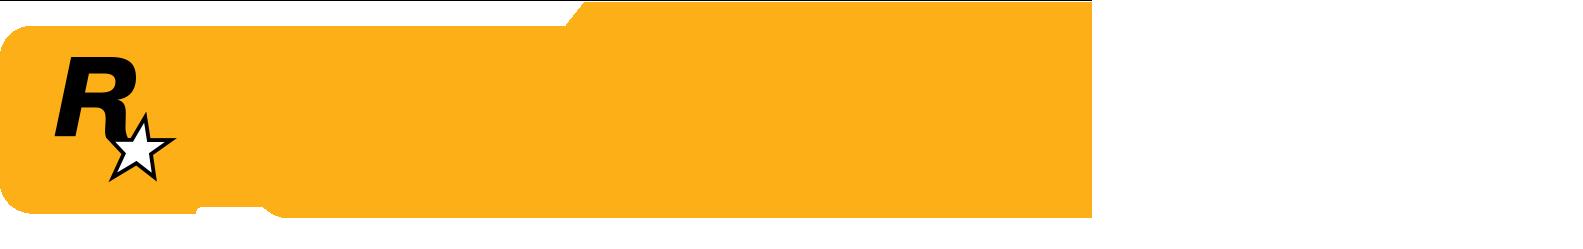 Social Club x Twitch Prime Benefits - Rockstar Games Social Club